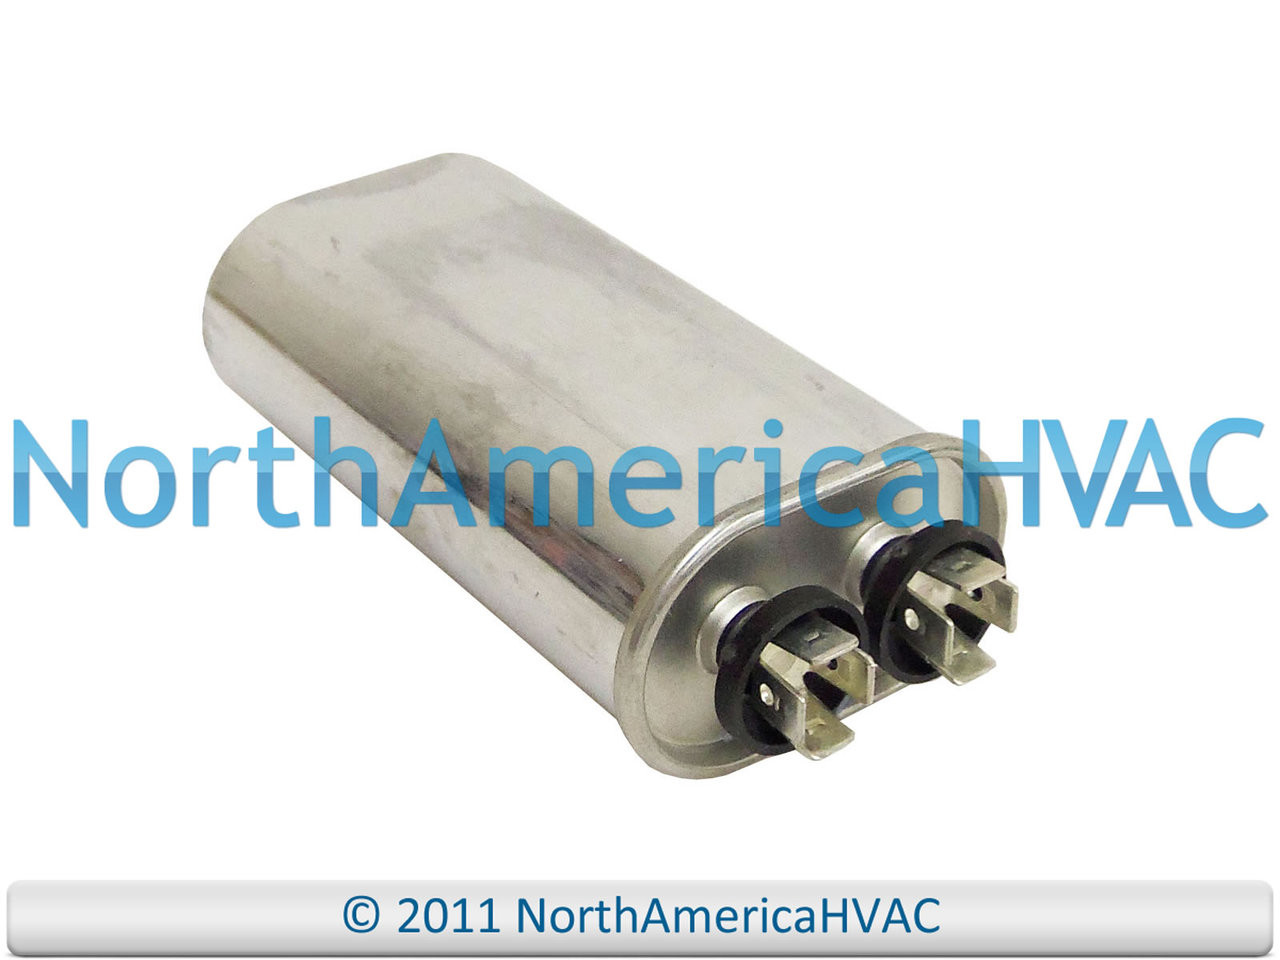 GE Genteq 12 5 uf 370 / 440 Volt Oval Capacitor Fits 97F9003 Z97F9003